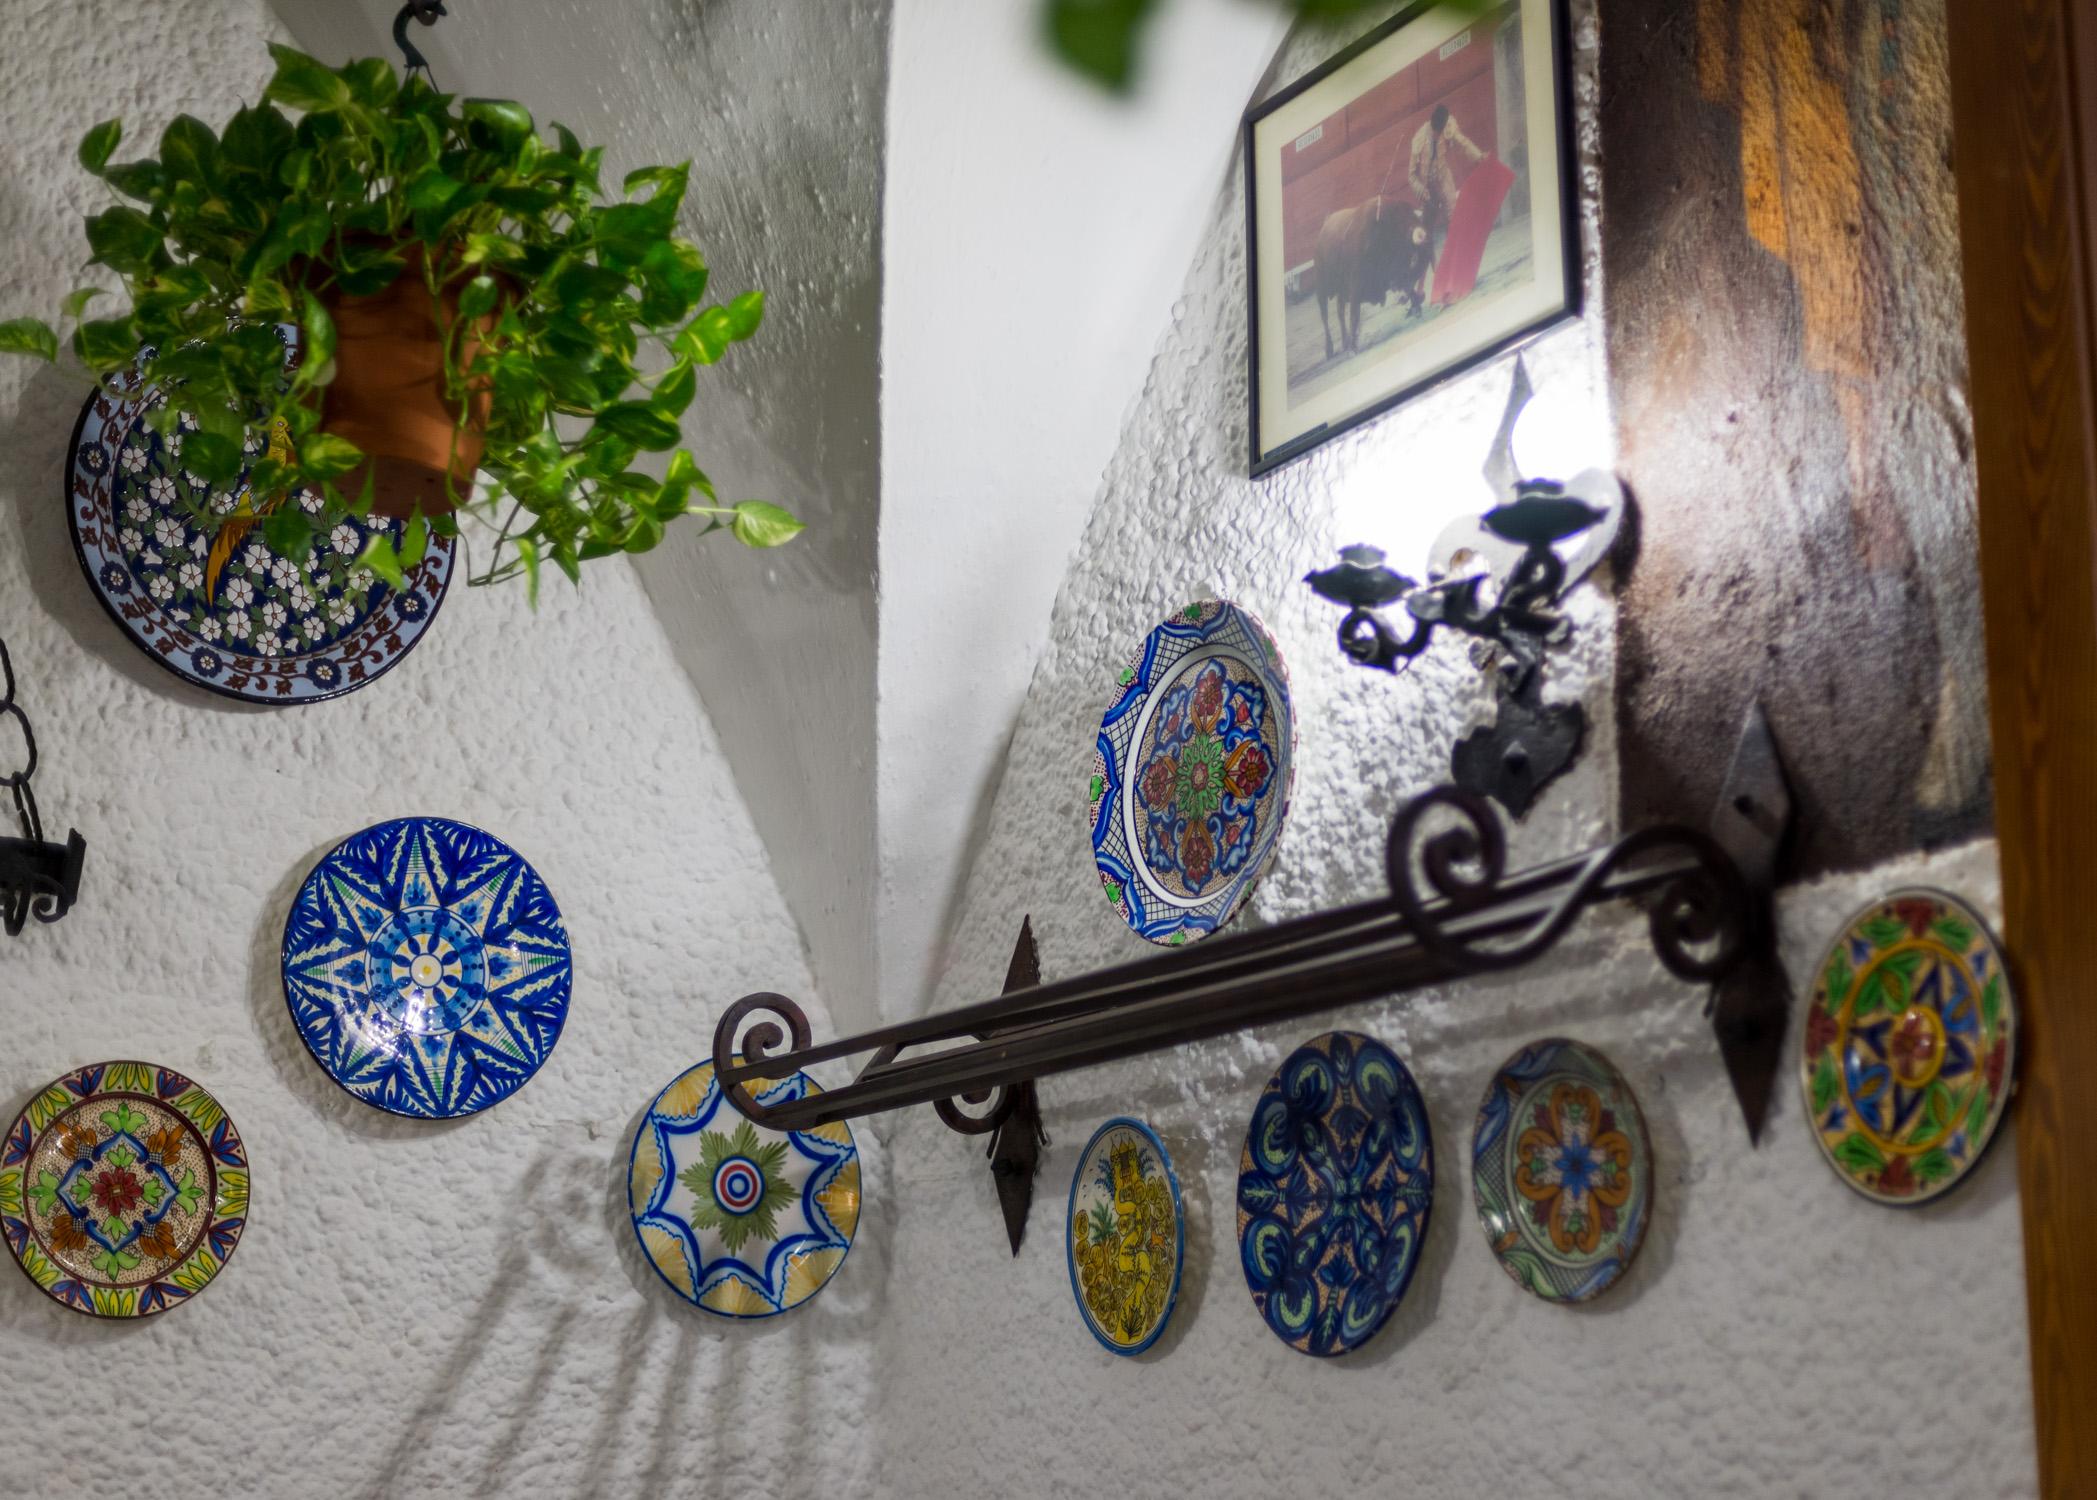 Restaurante Bocaito